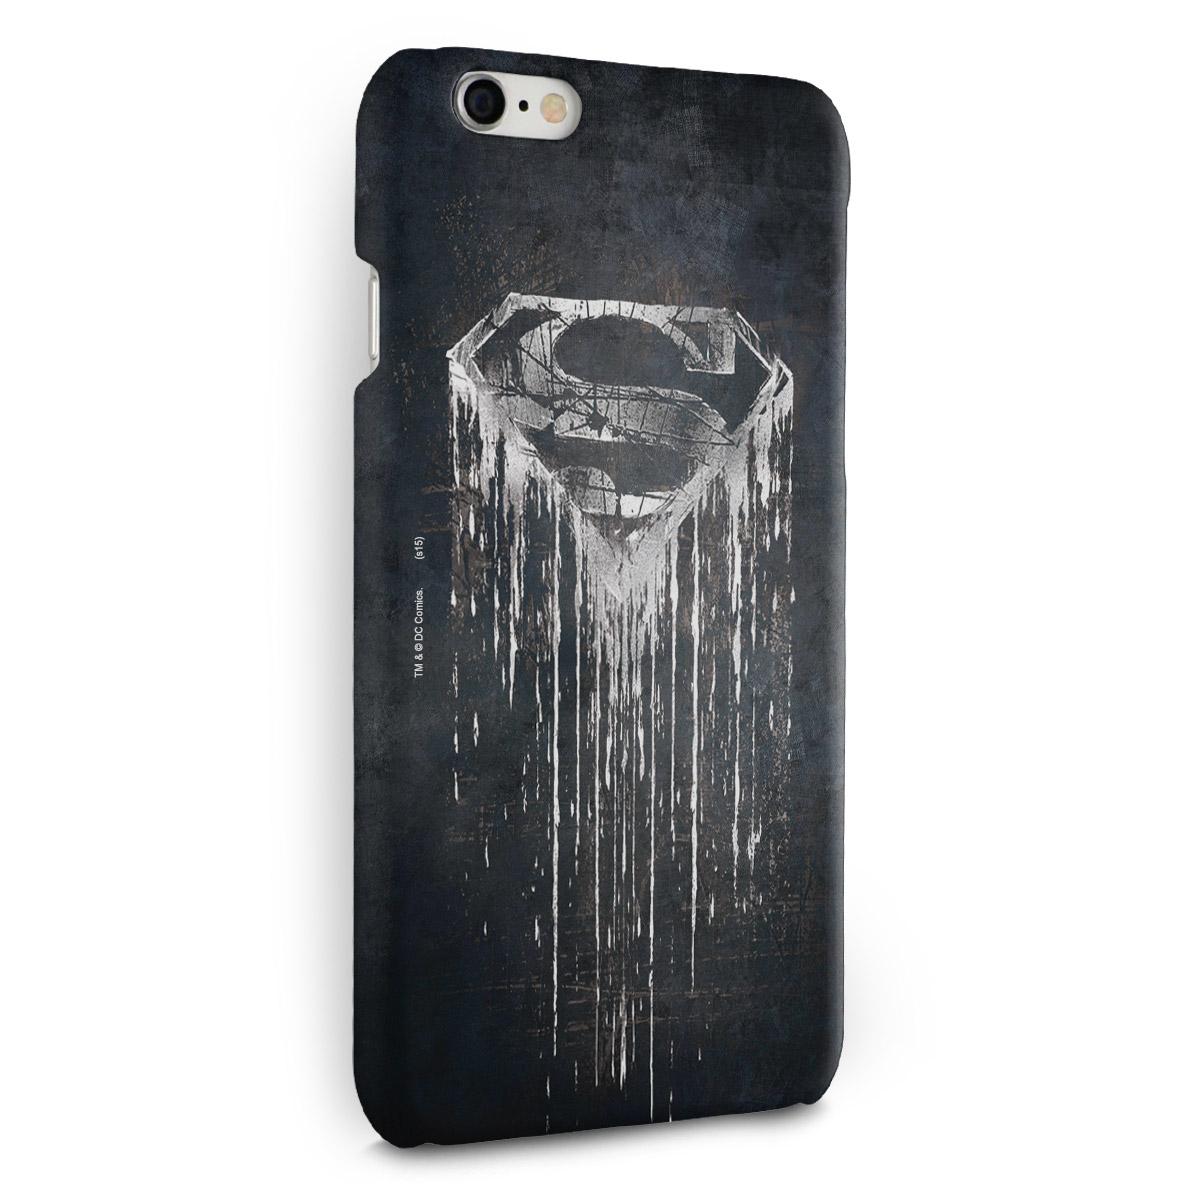 Capa para iPhone 6/6S Plus Superman Steel Melting